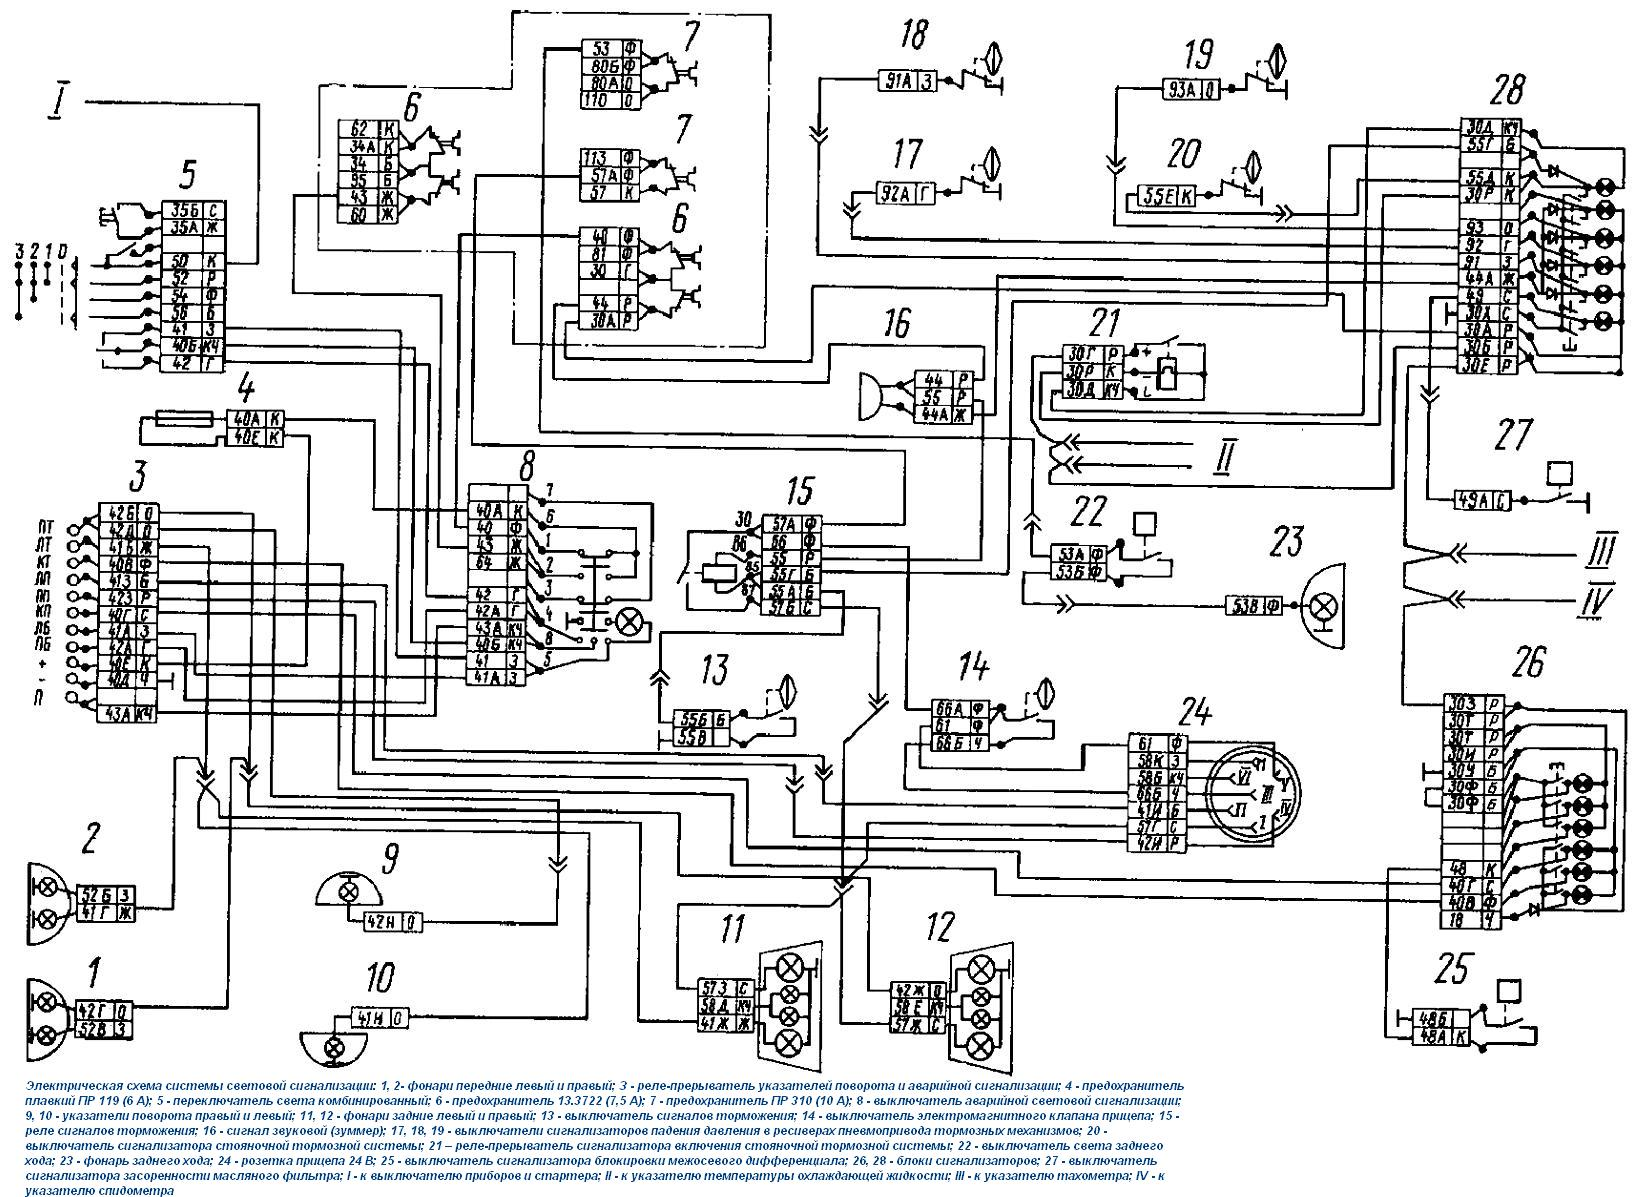 Электро схема автомобиль камаз